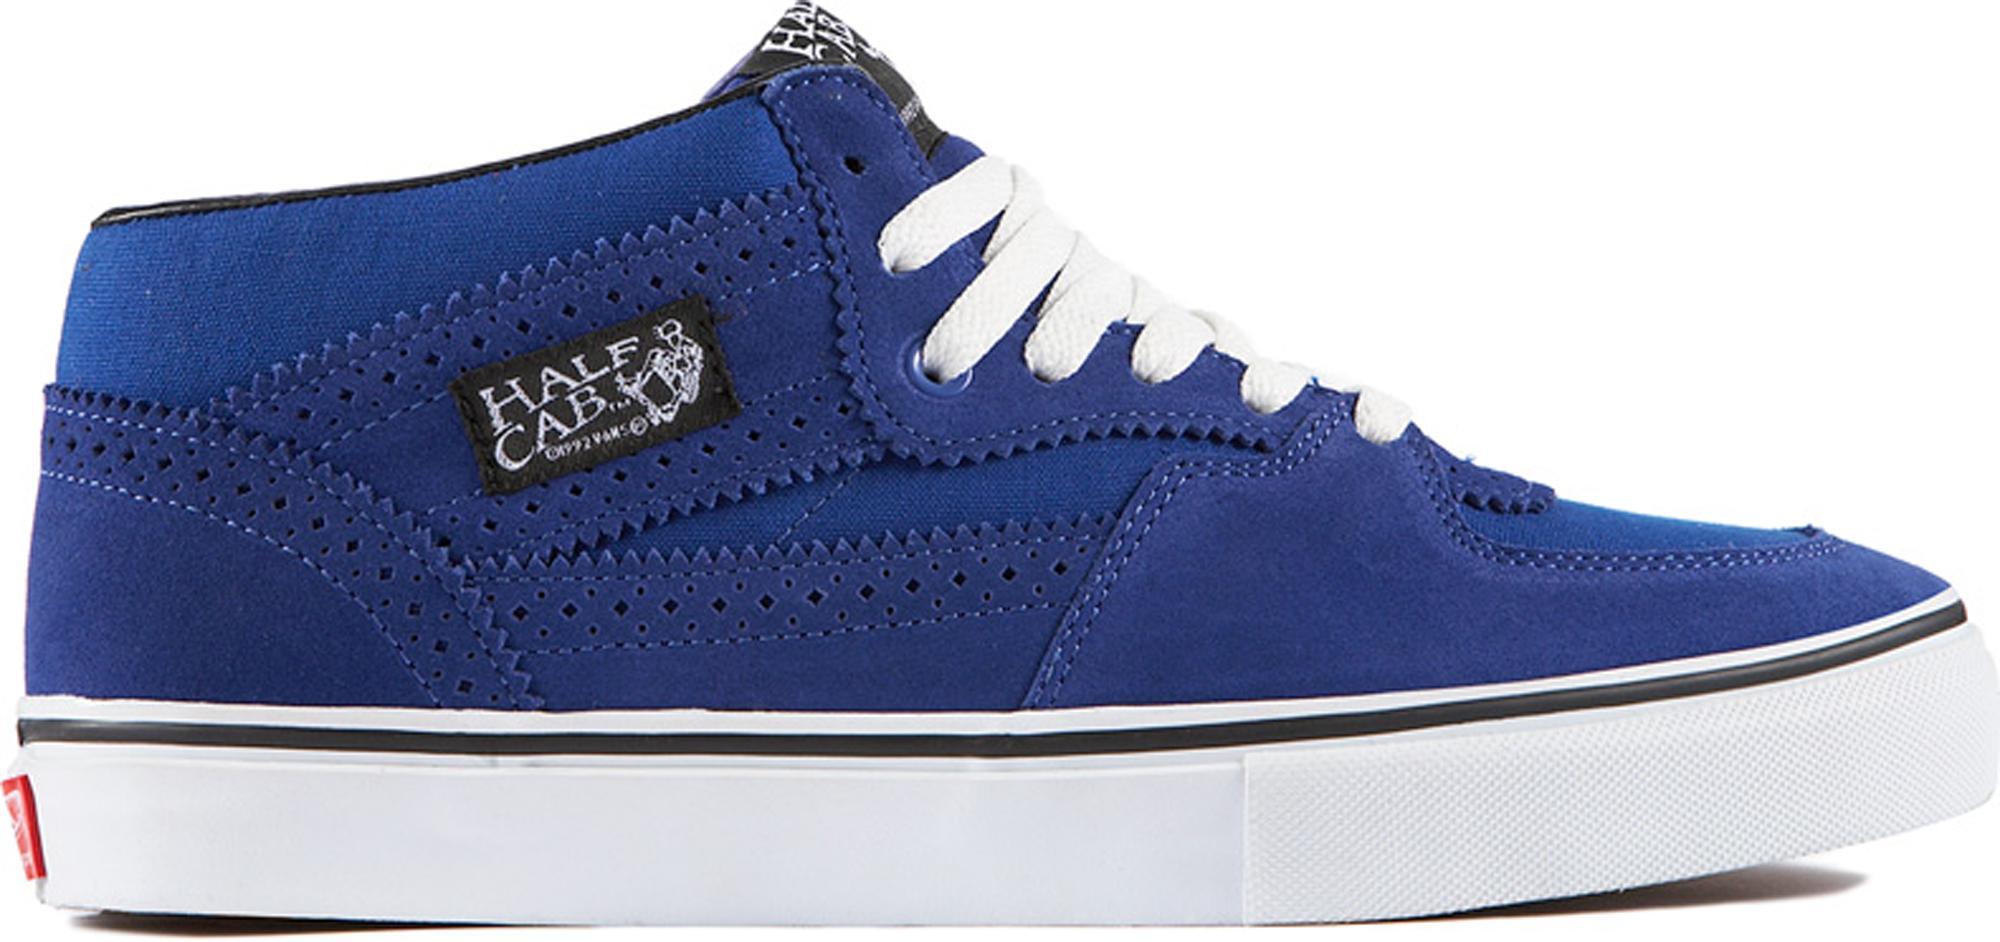 Lyst - Vans Half Cab Supreme Diamond Cut (blue) in Blue for Men 469707a44